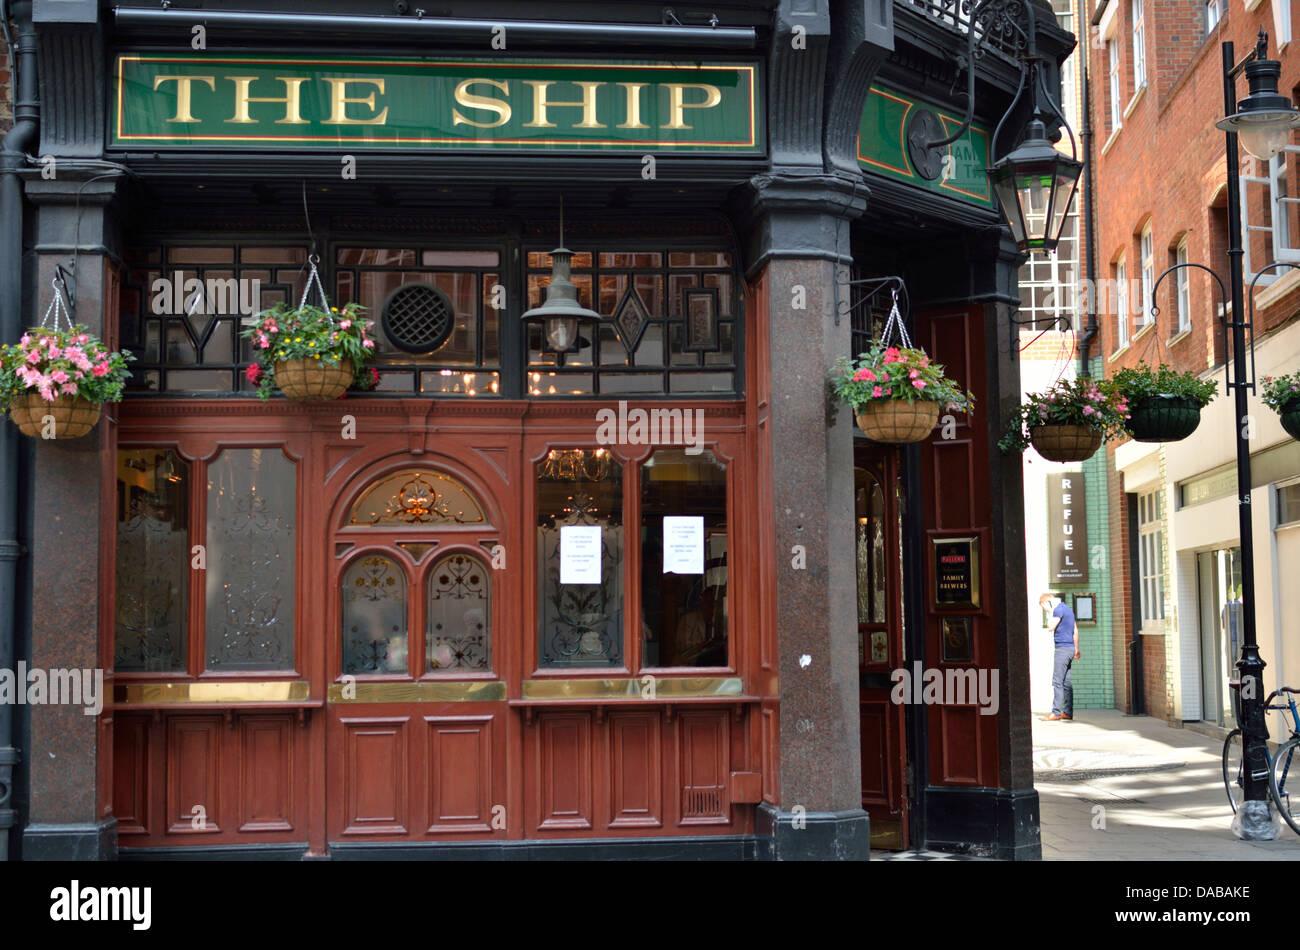 The Ship pub in Wardour Street, Soho, London, UK. - Stock Image